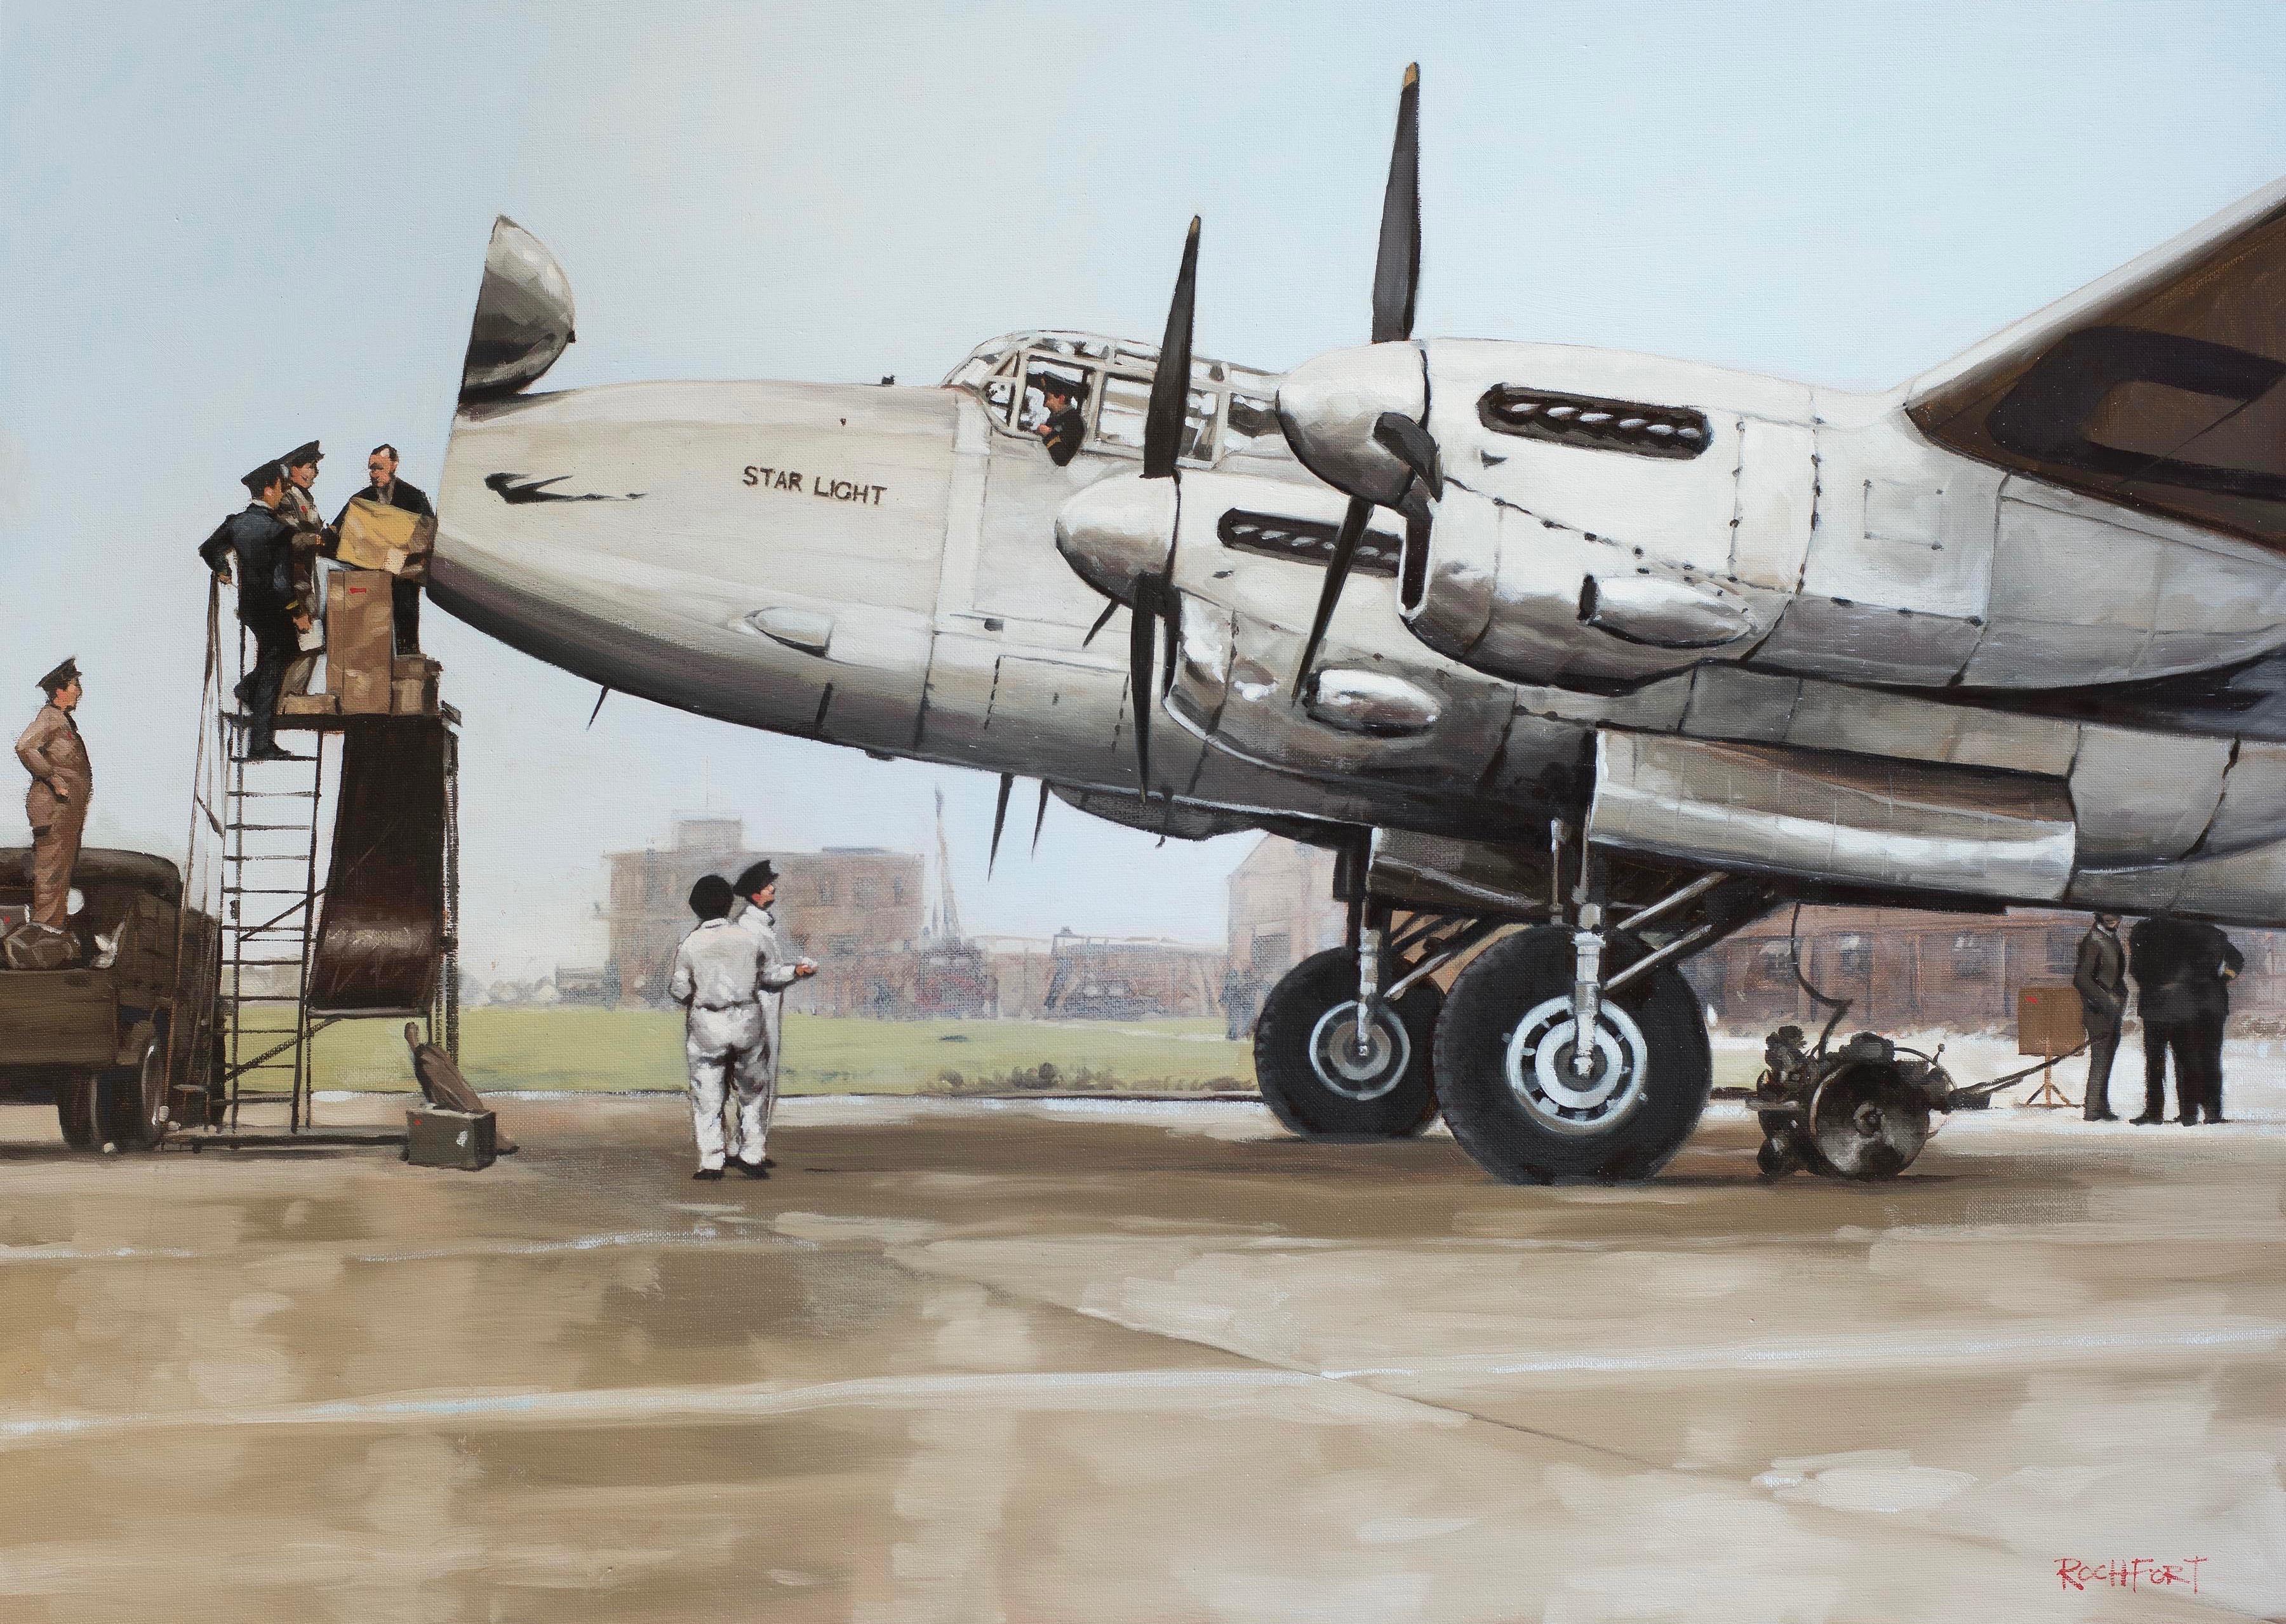 Star Light 1946